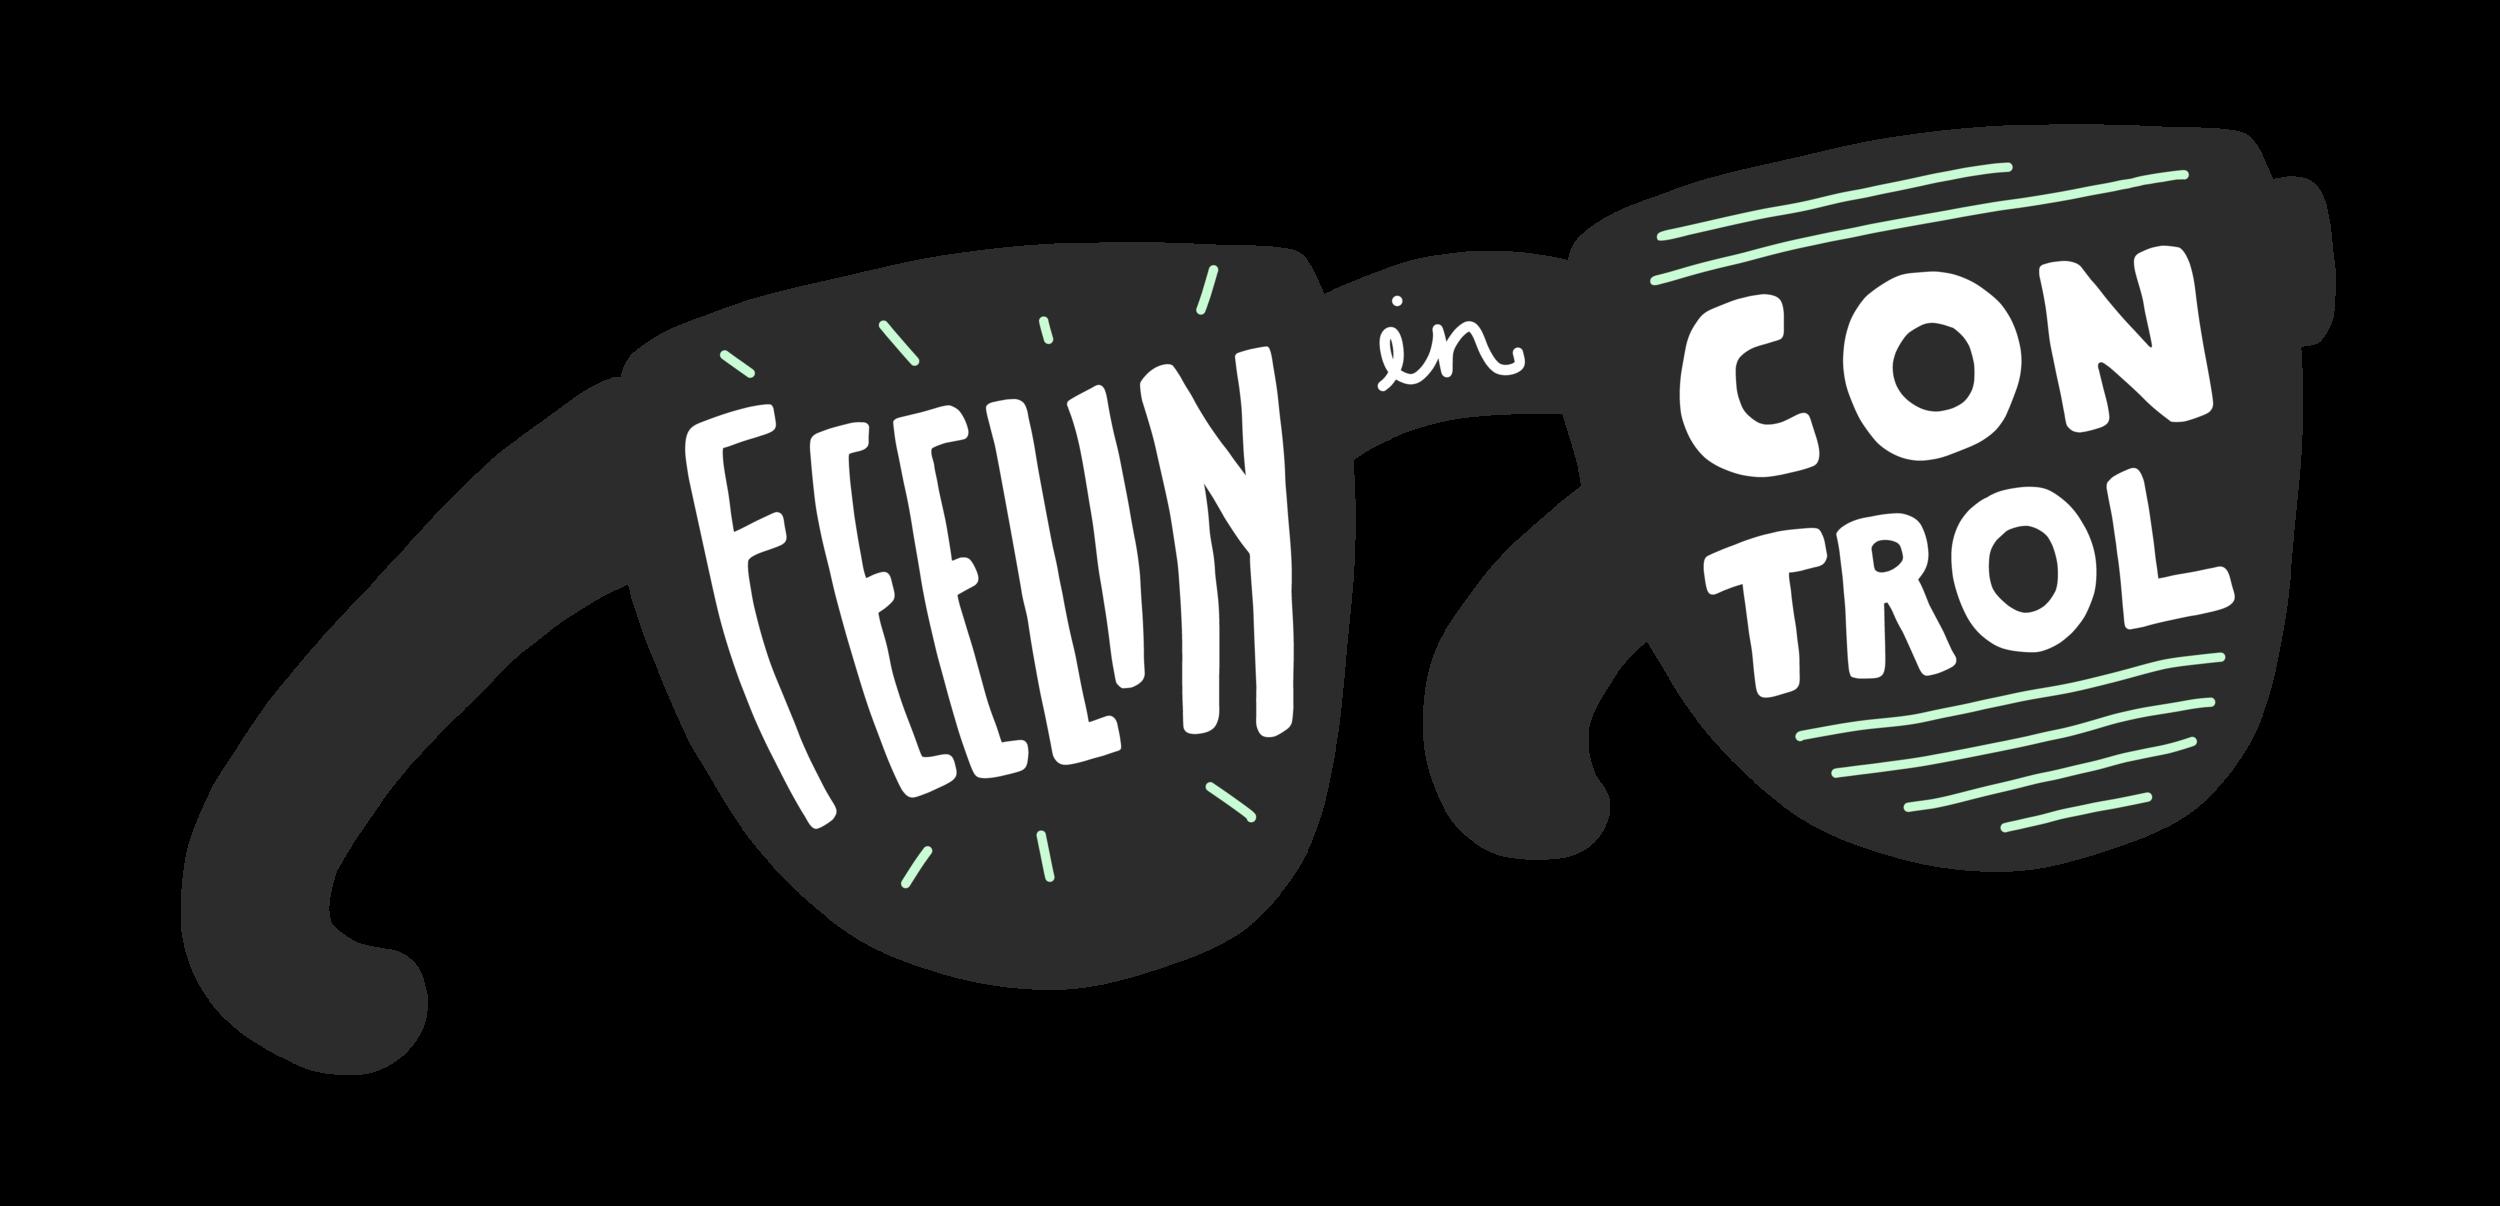 Insta_Feelin in control-01.png